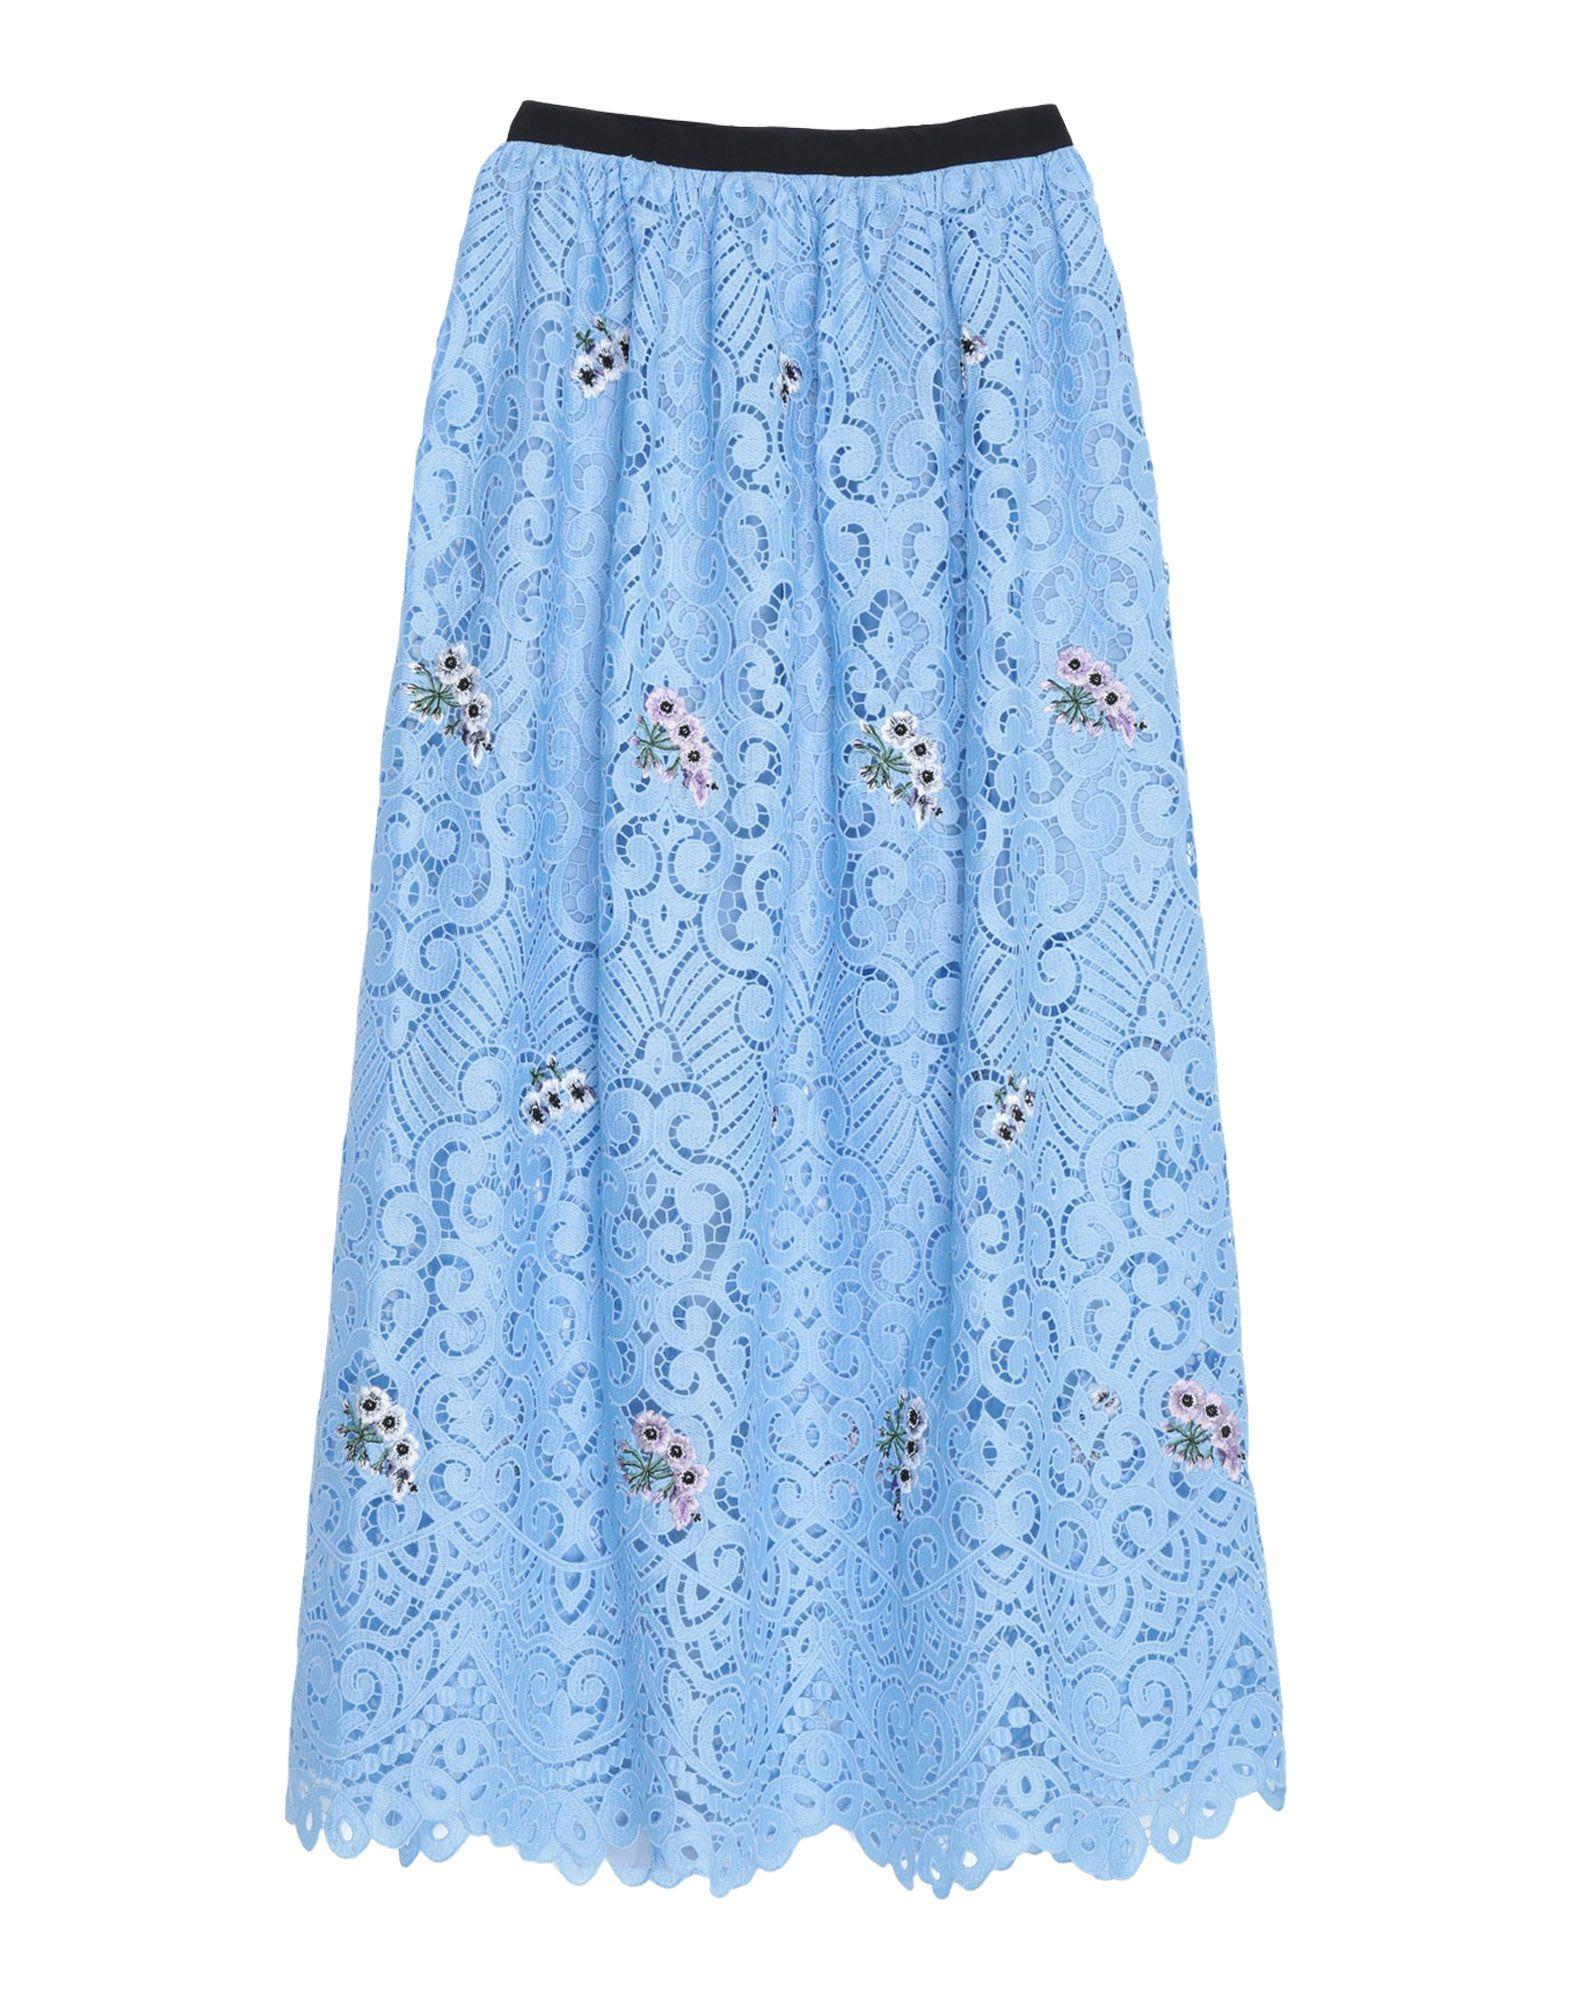 MARKUS LUPFER Длинная юбка юбка markus lupfer markus lupfer ma154ewhpjr2